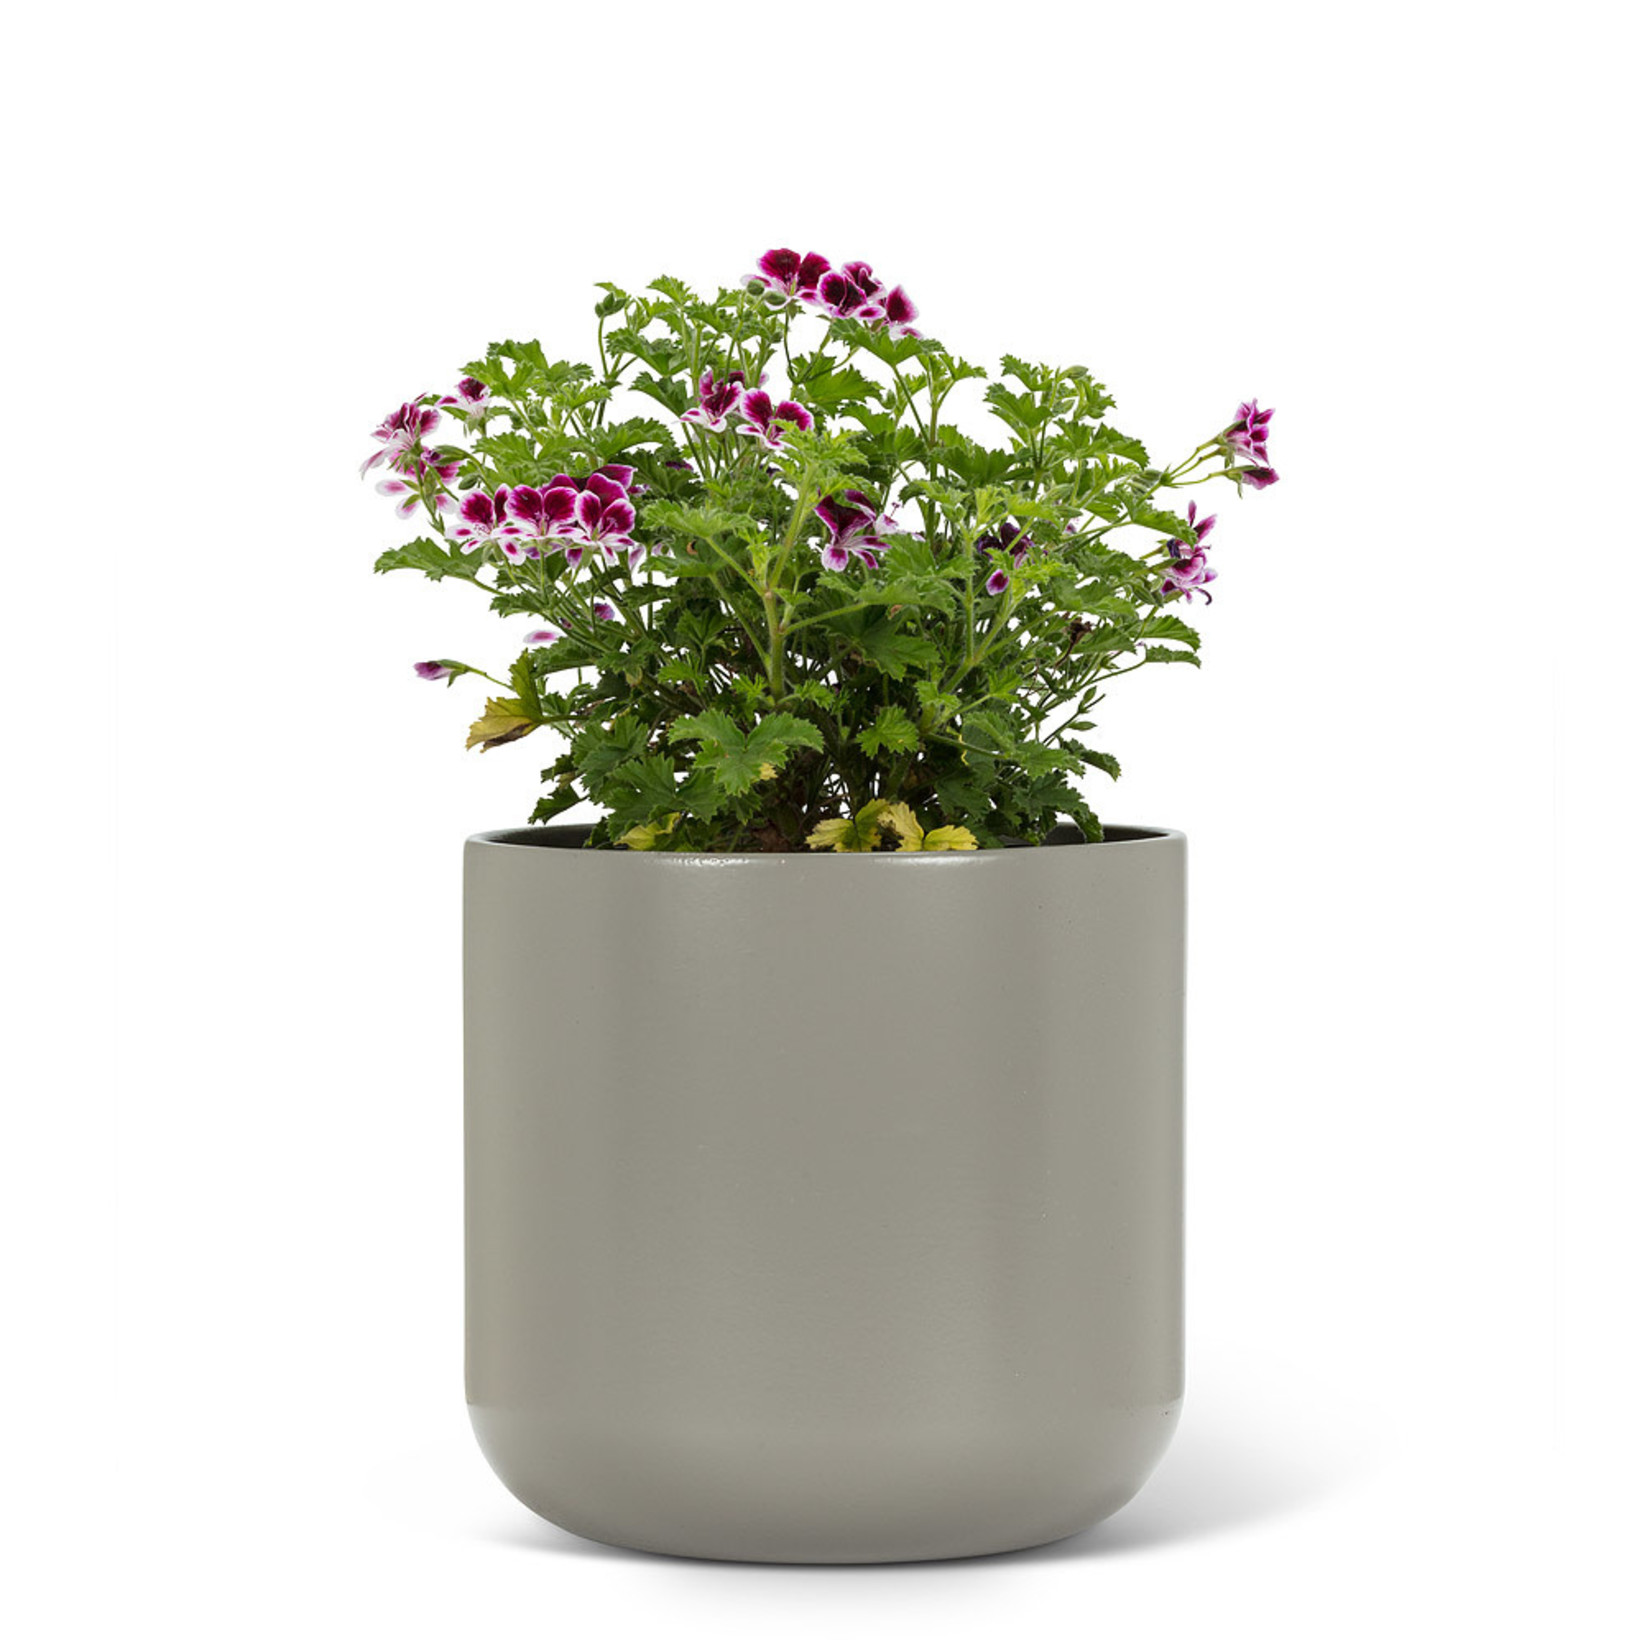 Abbott Cache-Pot GRAYDON - Large